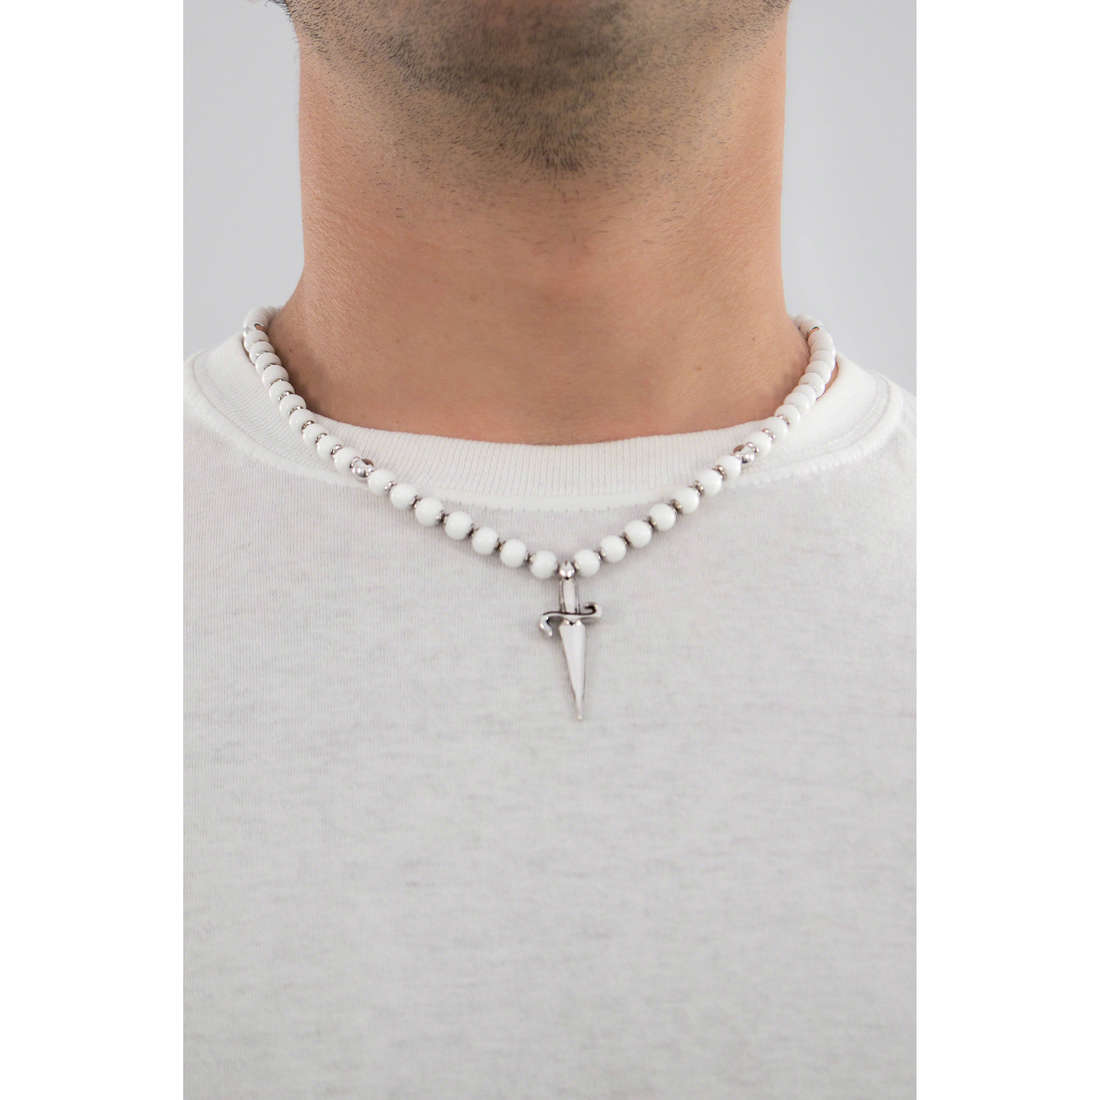 Cesare Paciotti necklaces man JPCL0123B indosso